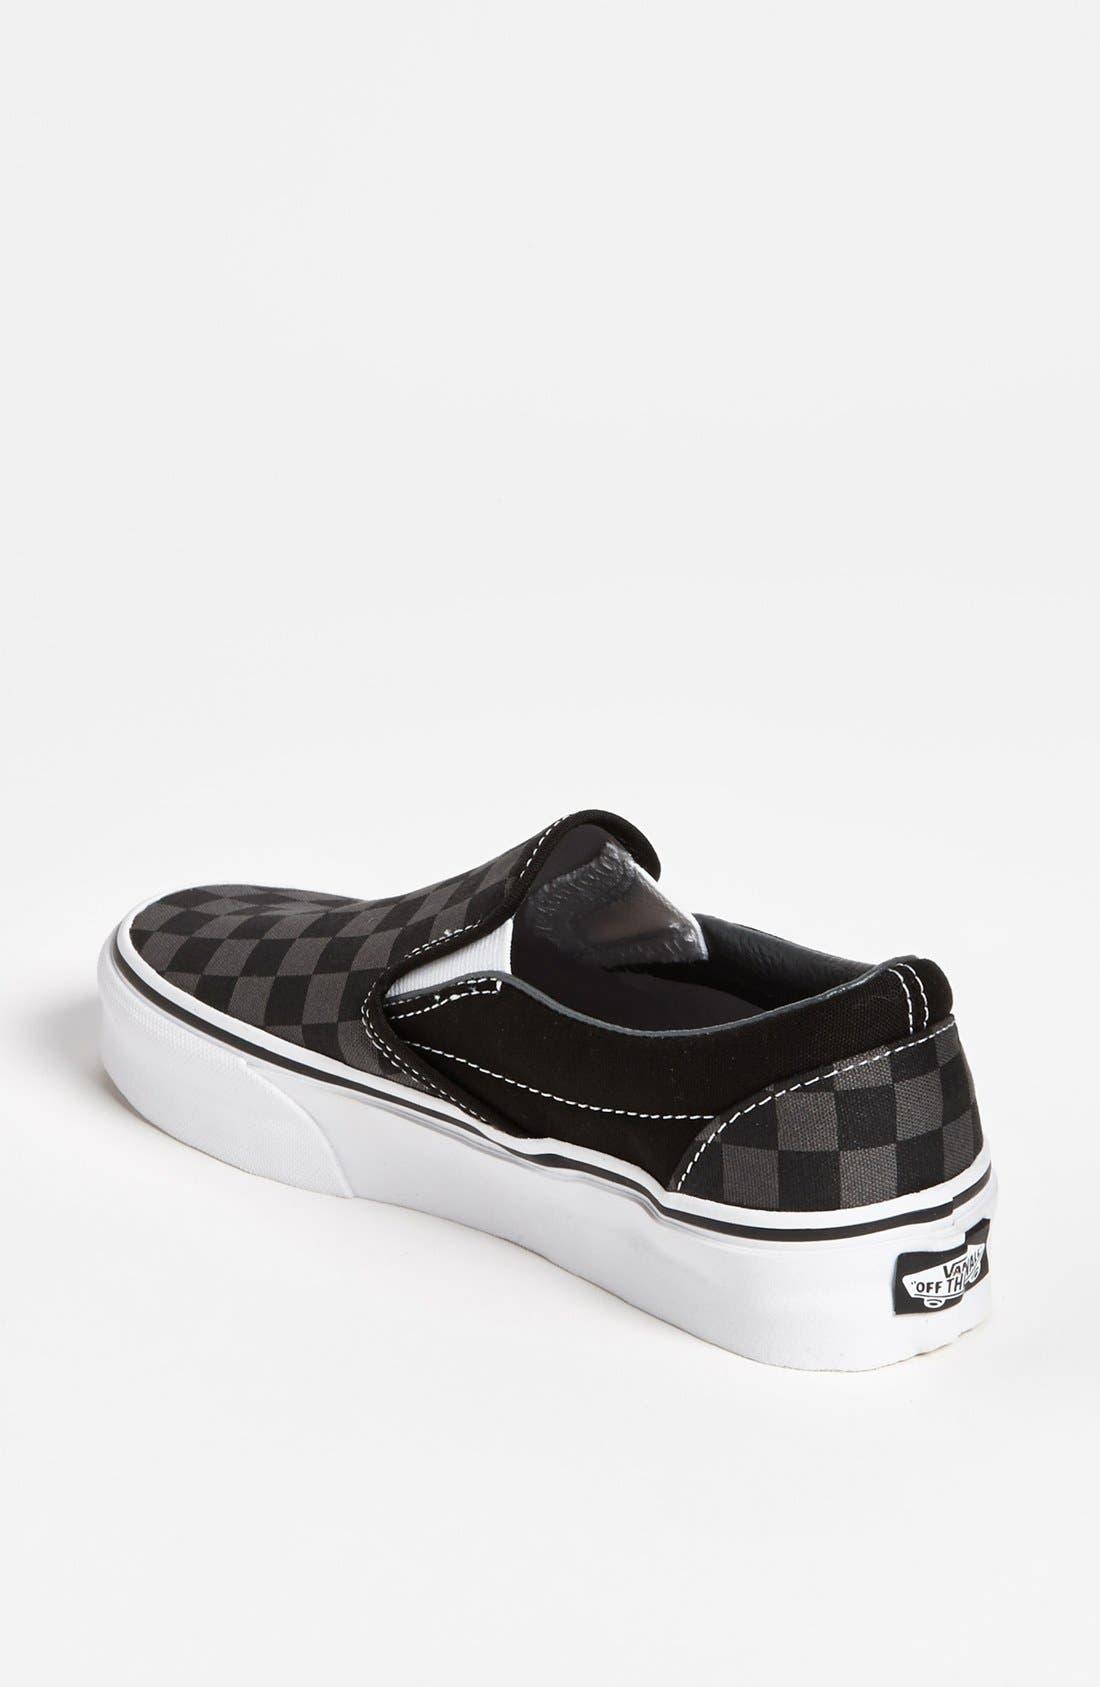 'Classic - Checker' Sneaker,                             Alternate thumbnail 4, color,                             020